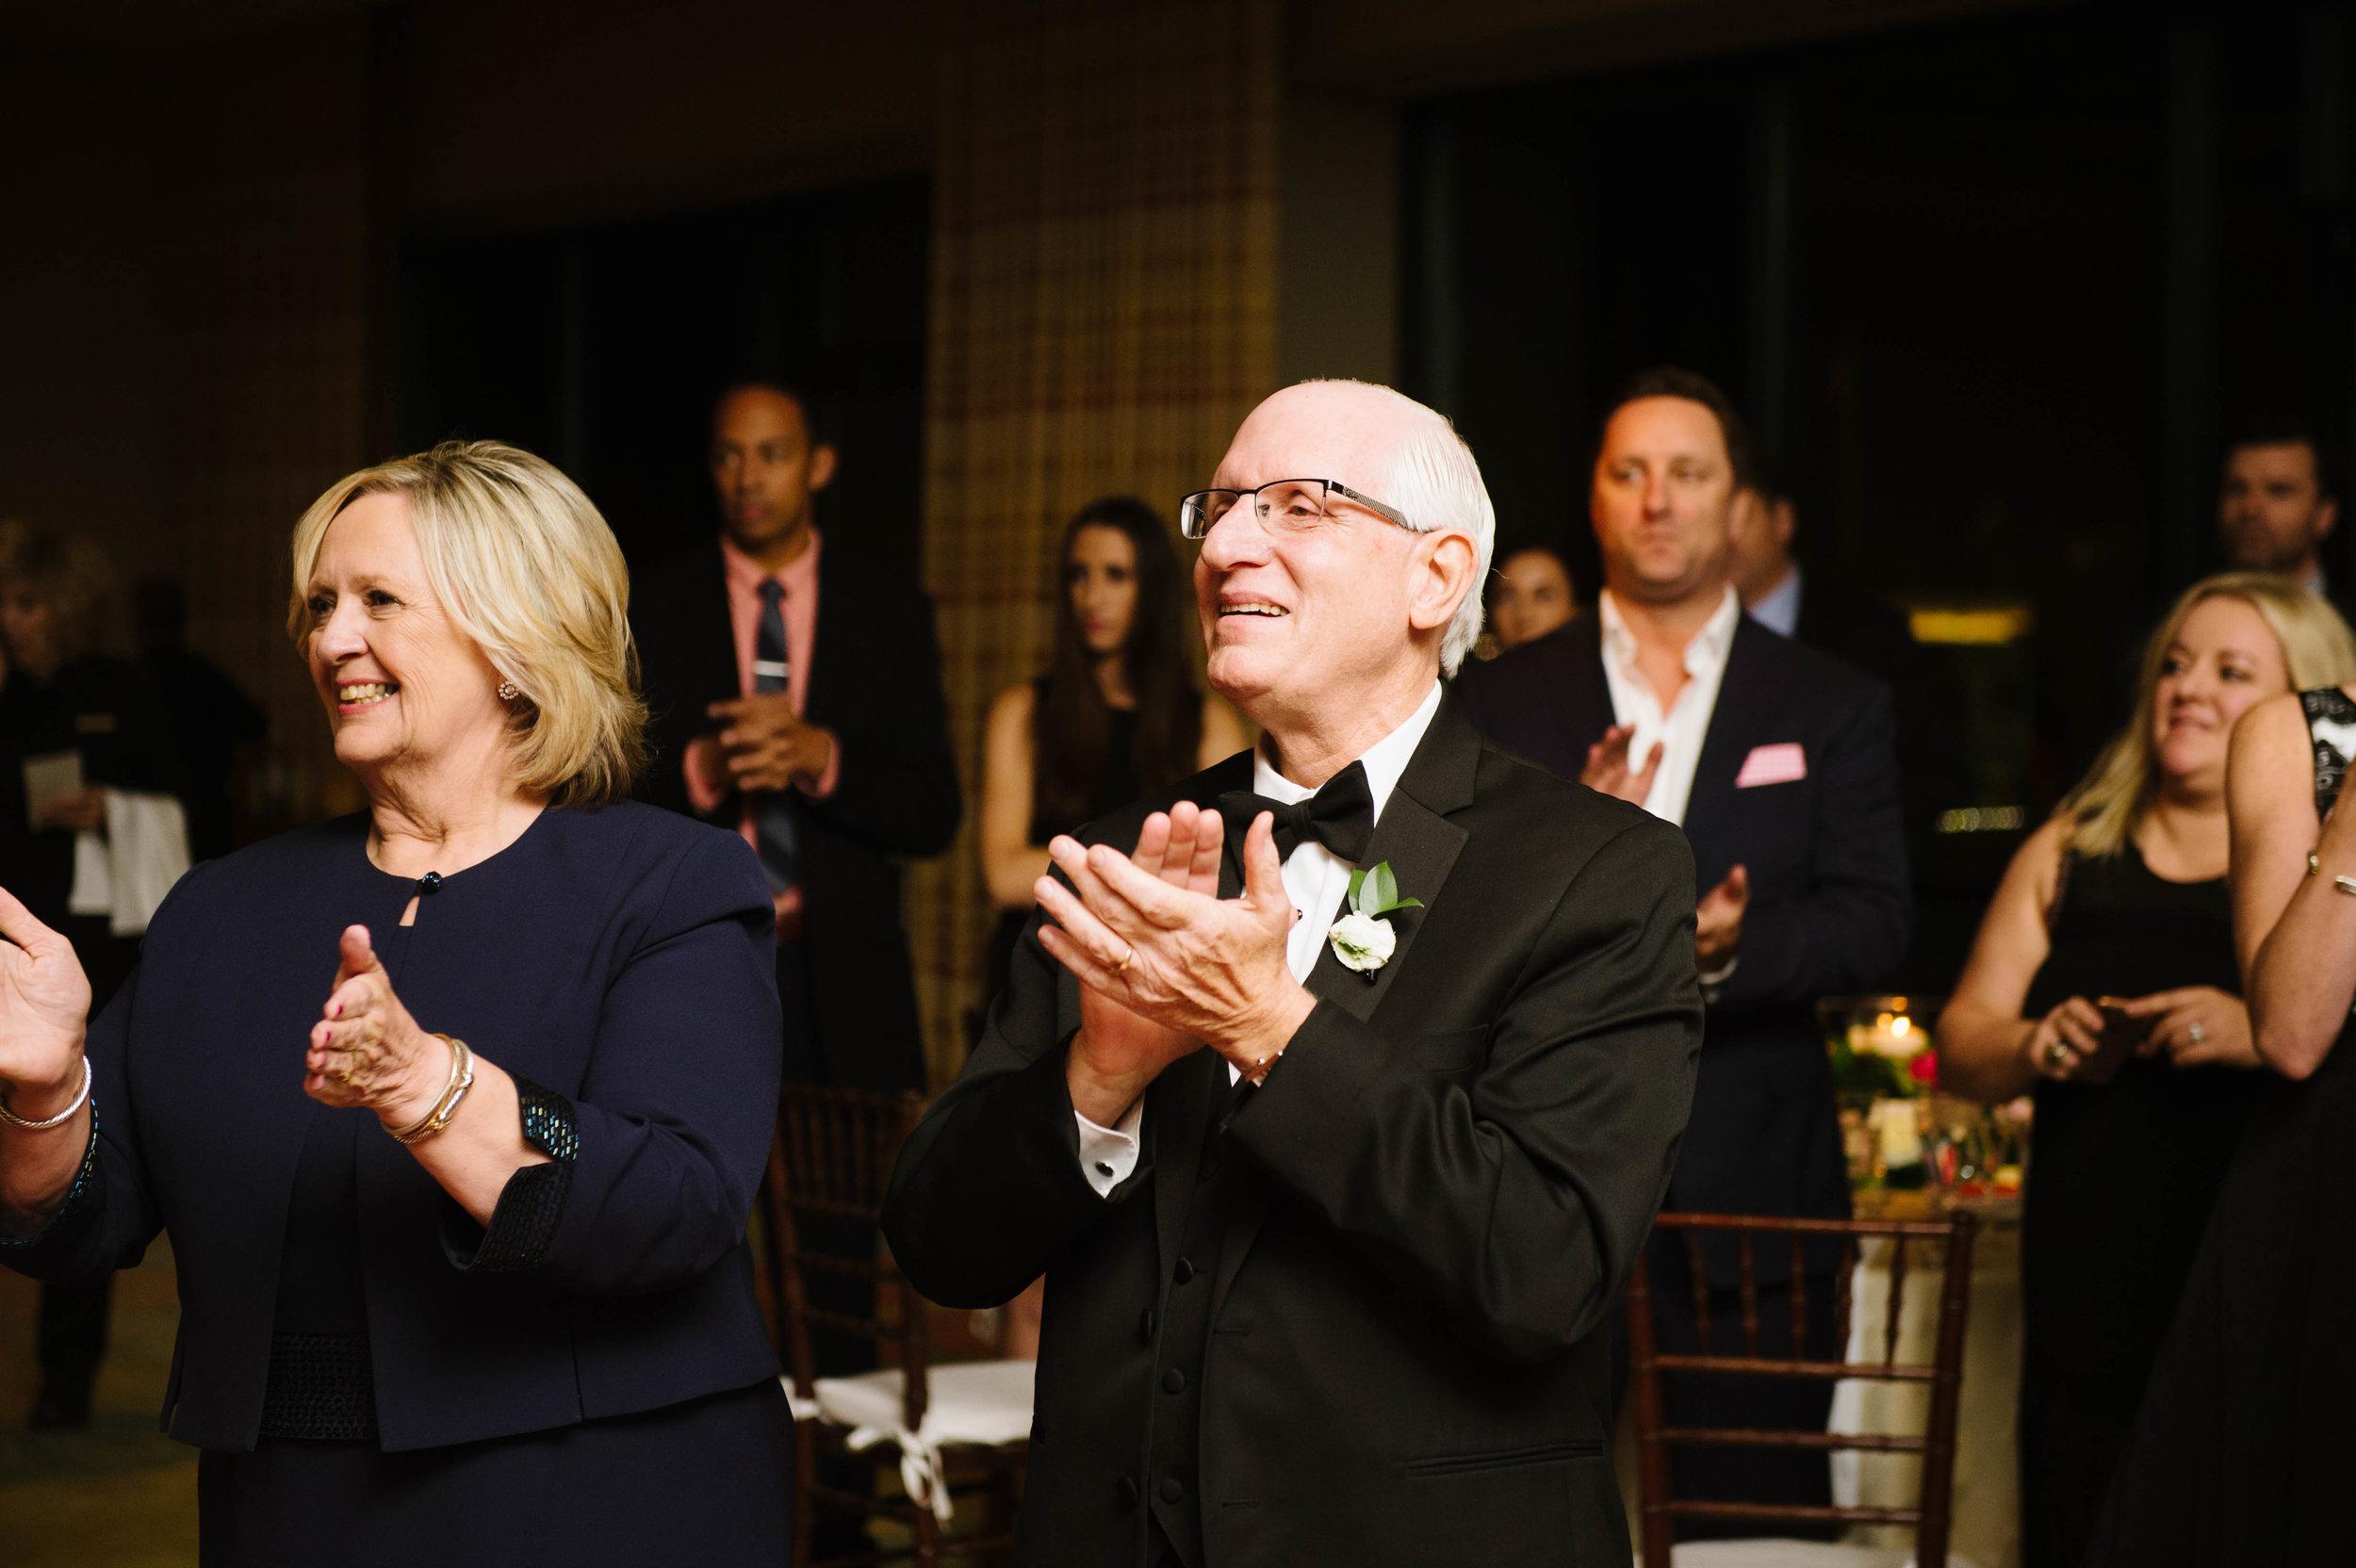 Seaport-Hotel-Boston-Wedding14.jpg